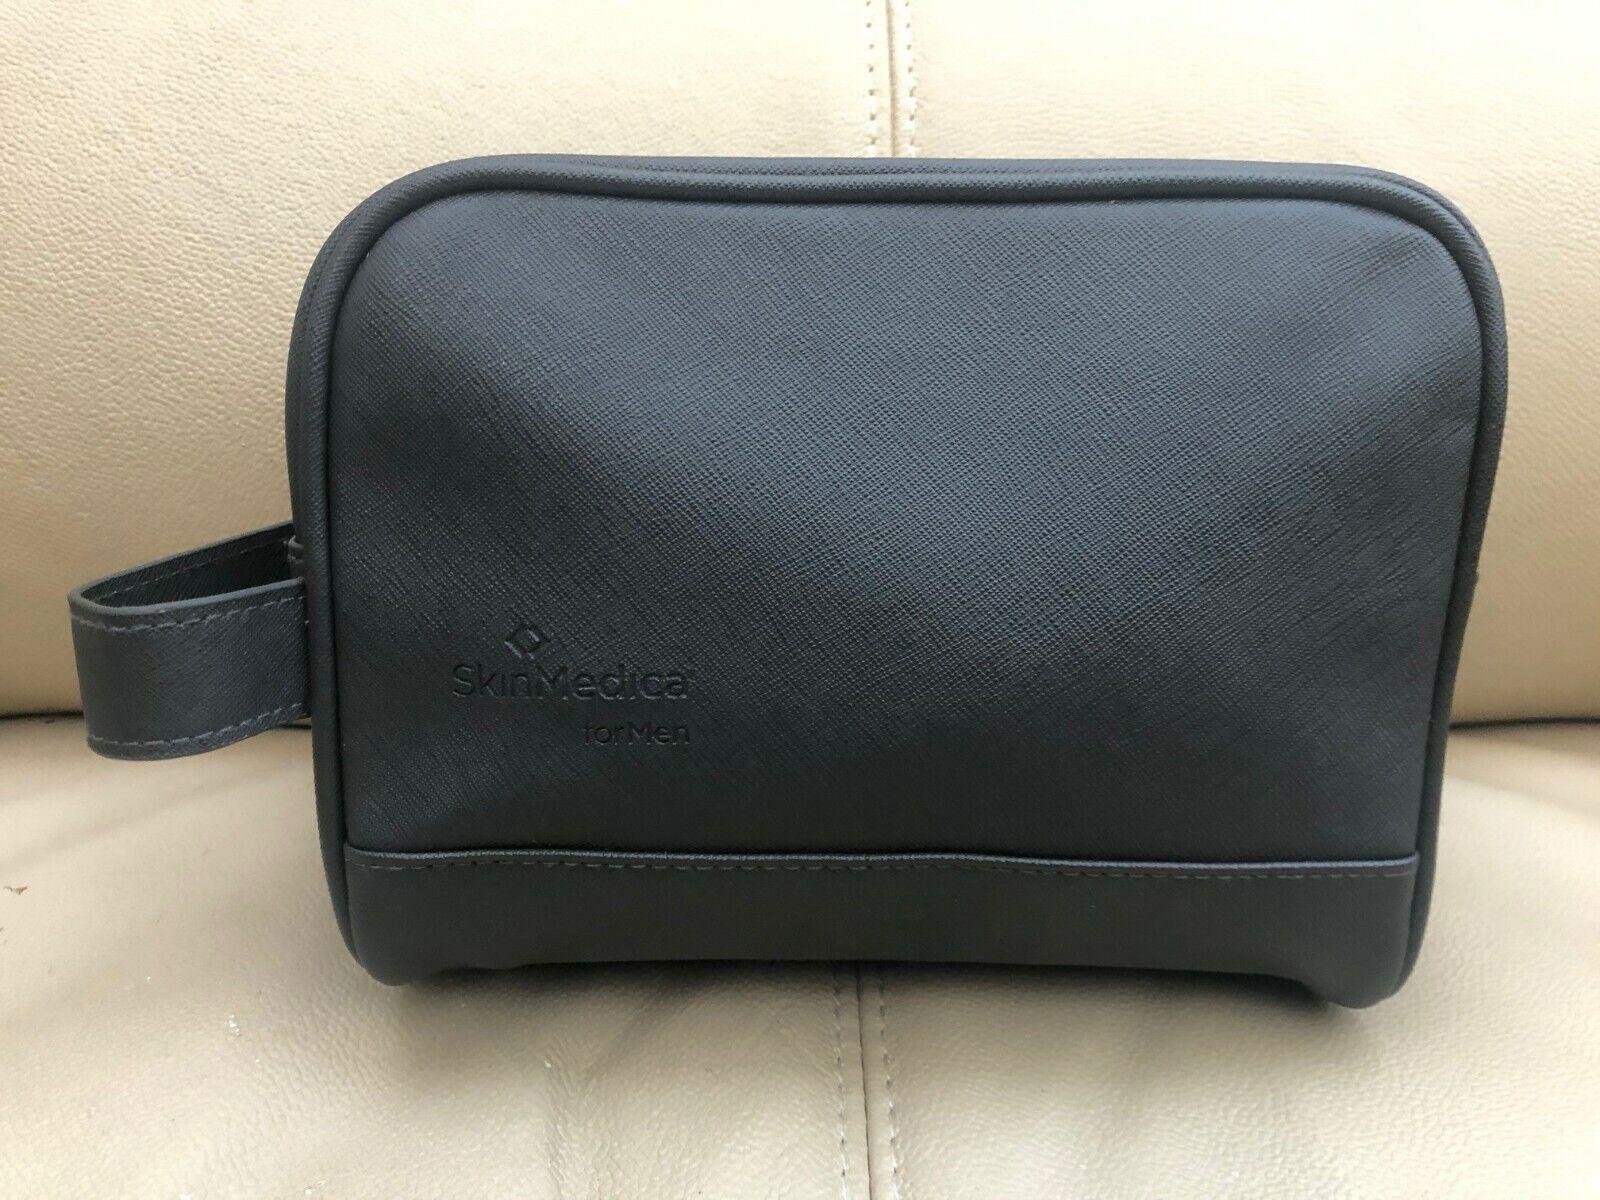 Waterproof Skinmedica Travel Pouch Bag Mens Toiletry Organiz